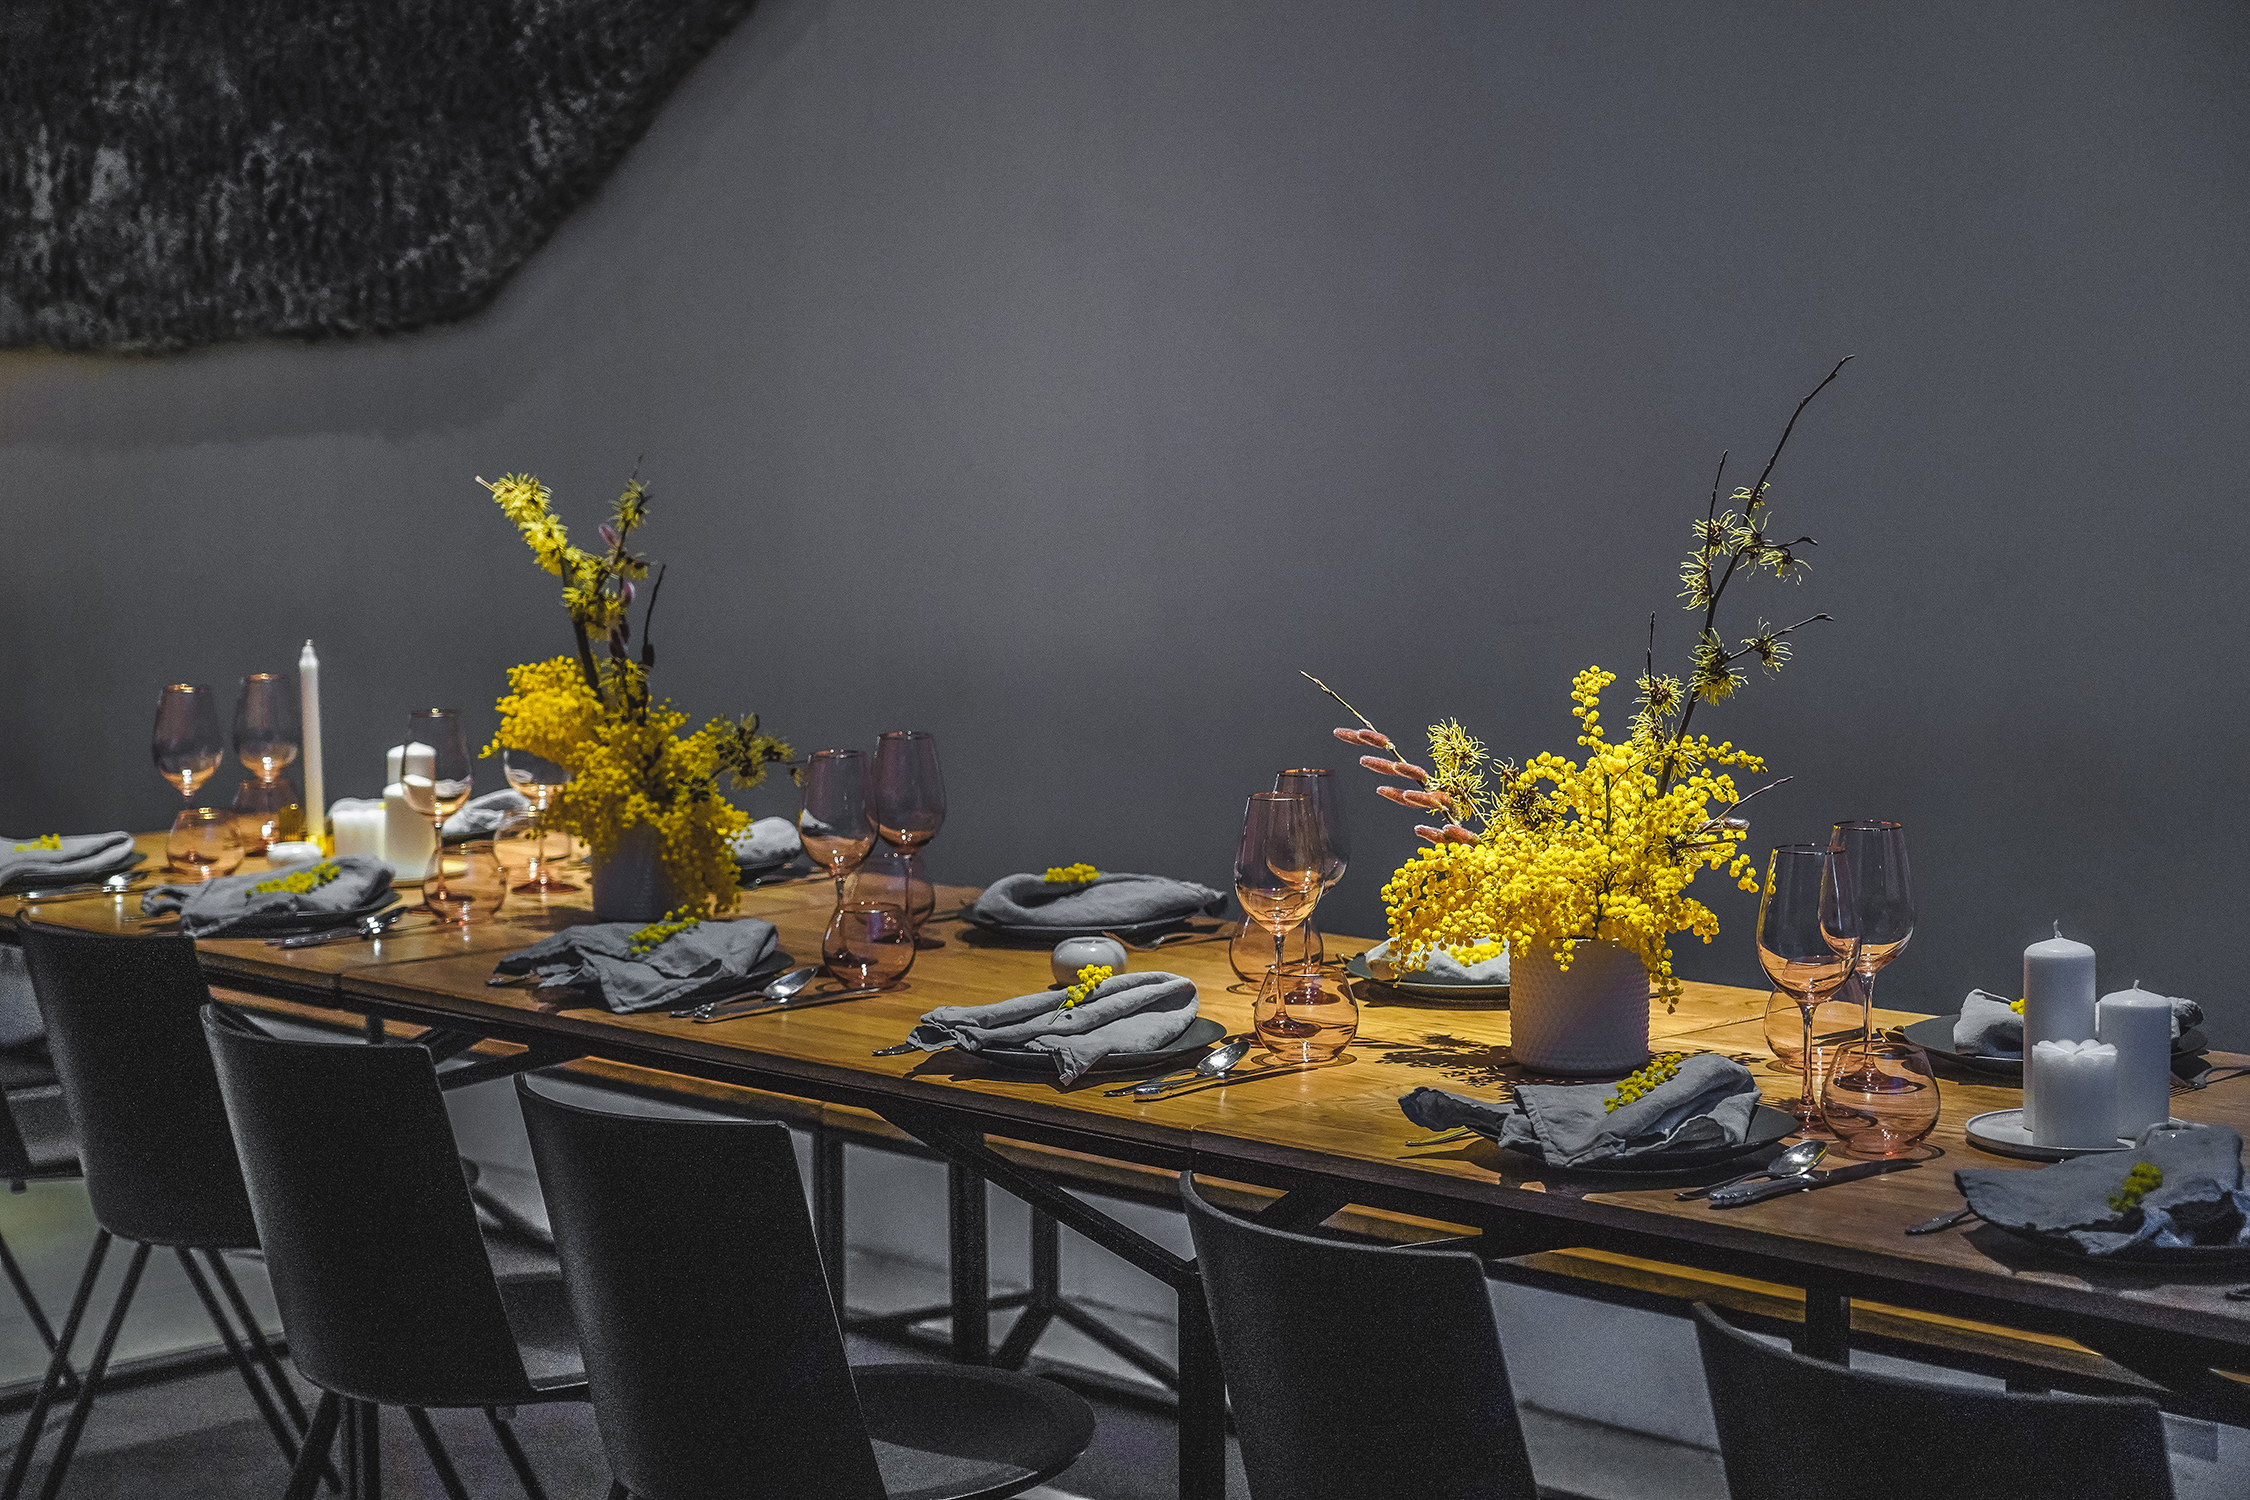 Location:  Baldon  / Design + Styling:  Wishbone  / Florals: Wishbone / Photography:  Nadira Tania